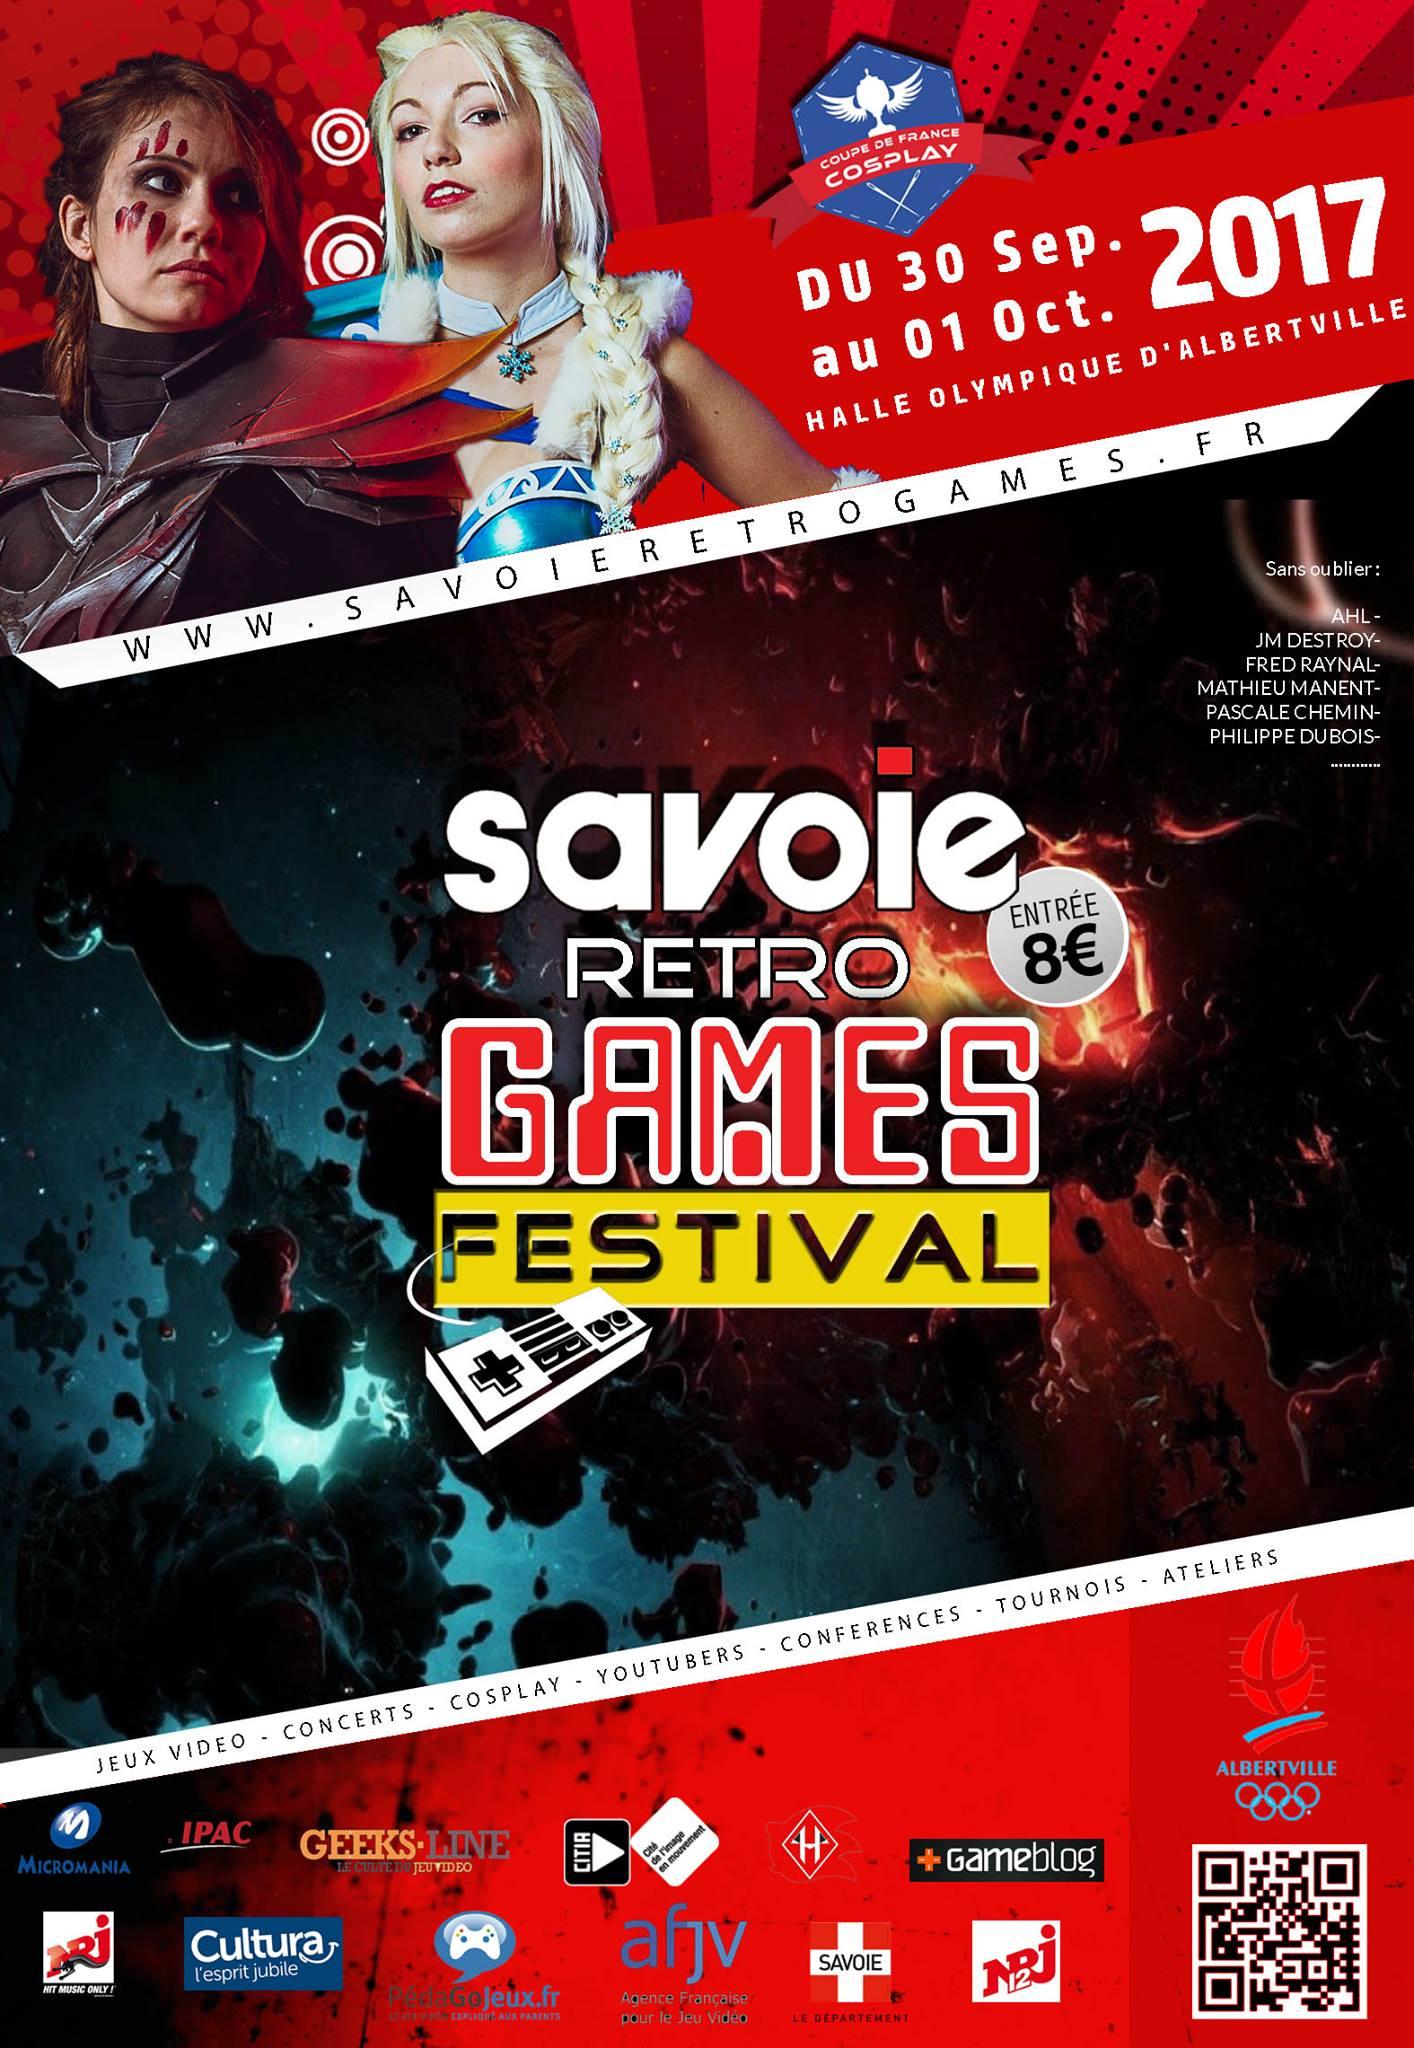 Savoie Retro Games 2017